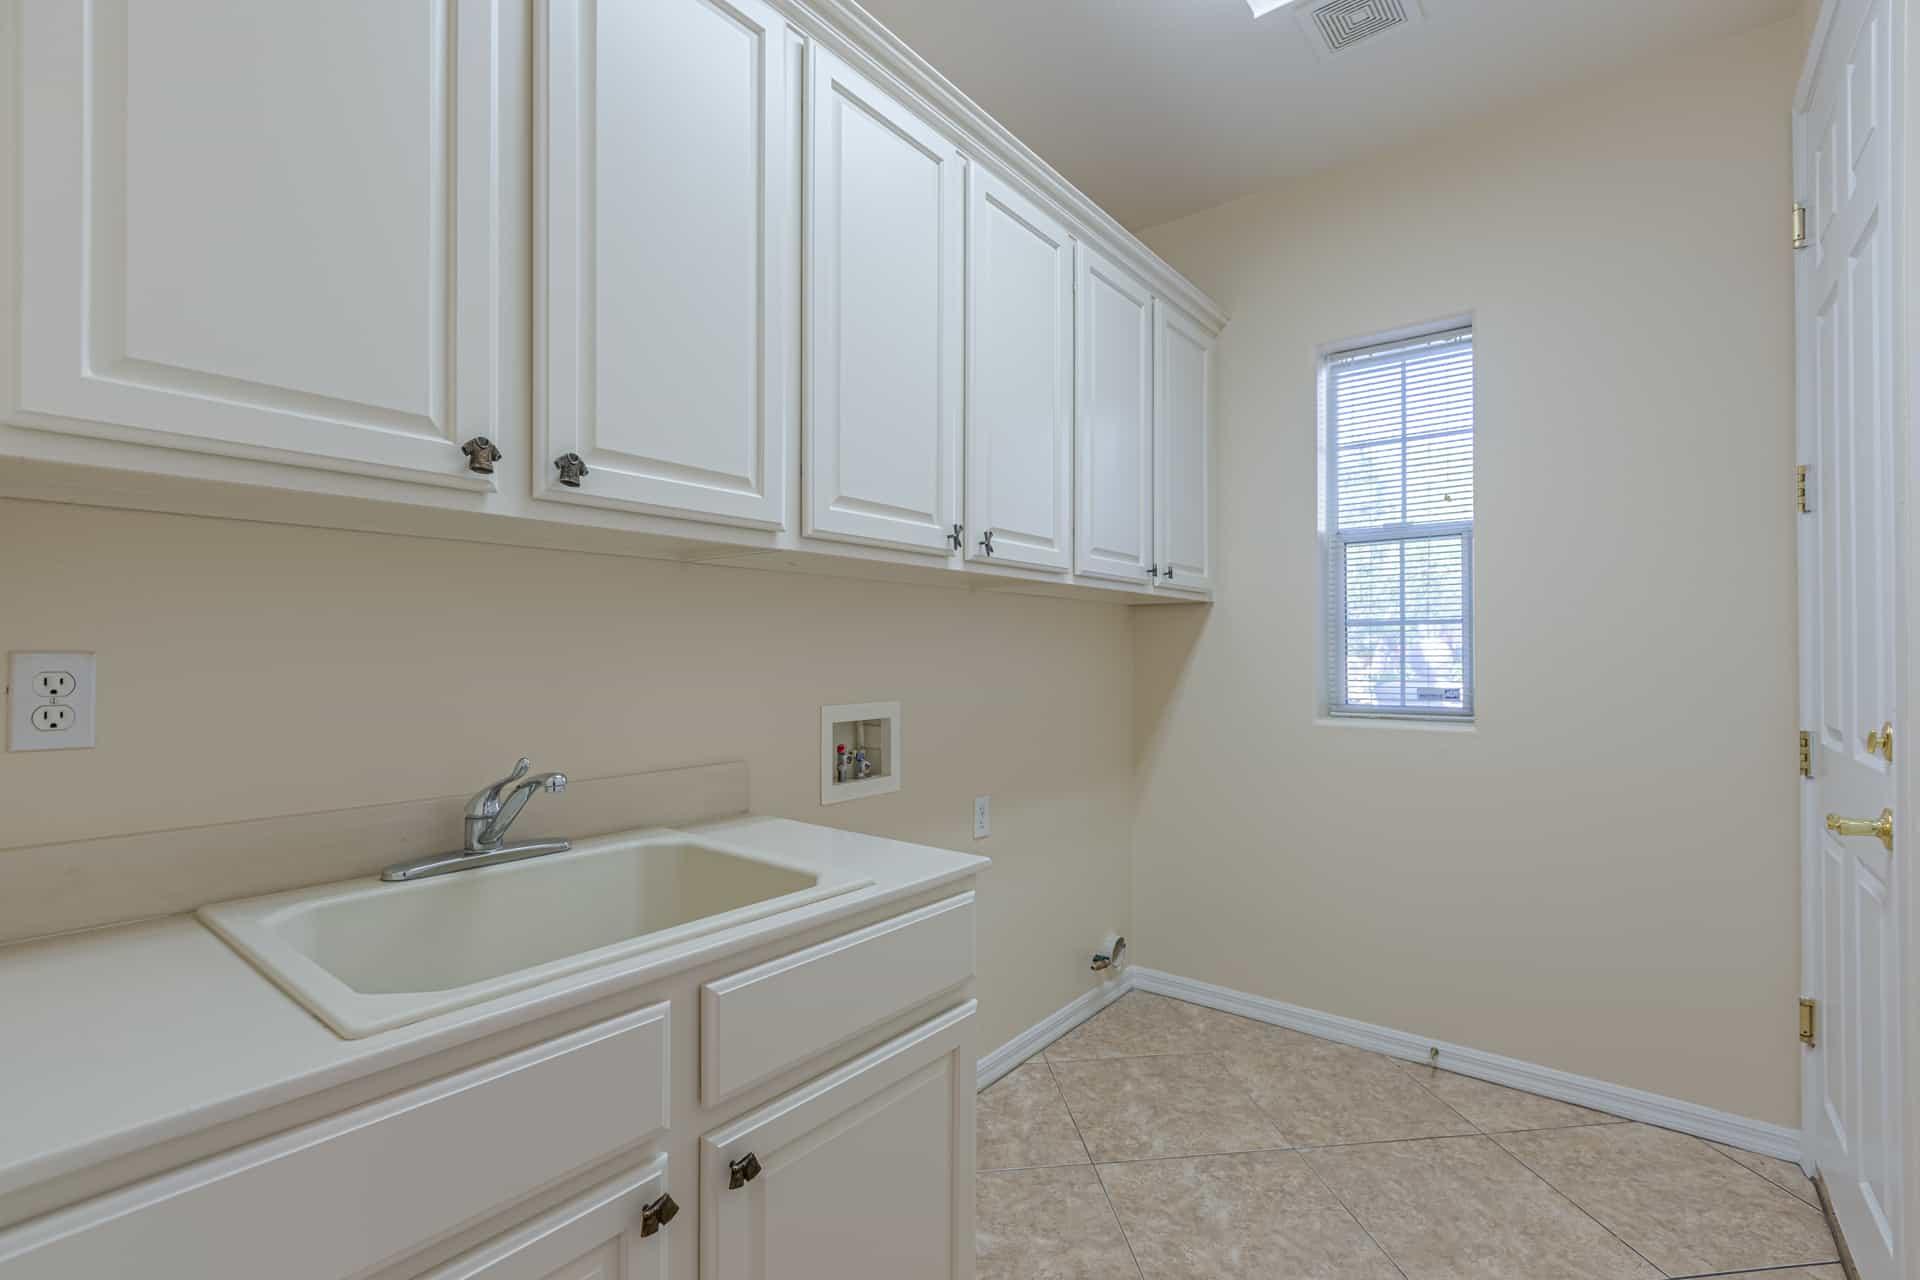 las-vegas-luxry-real-estate-realtor-rob-jensen-company-10729-grey-havens-court-willow-creek2657